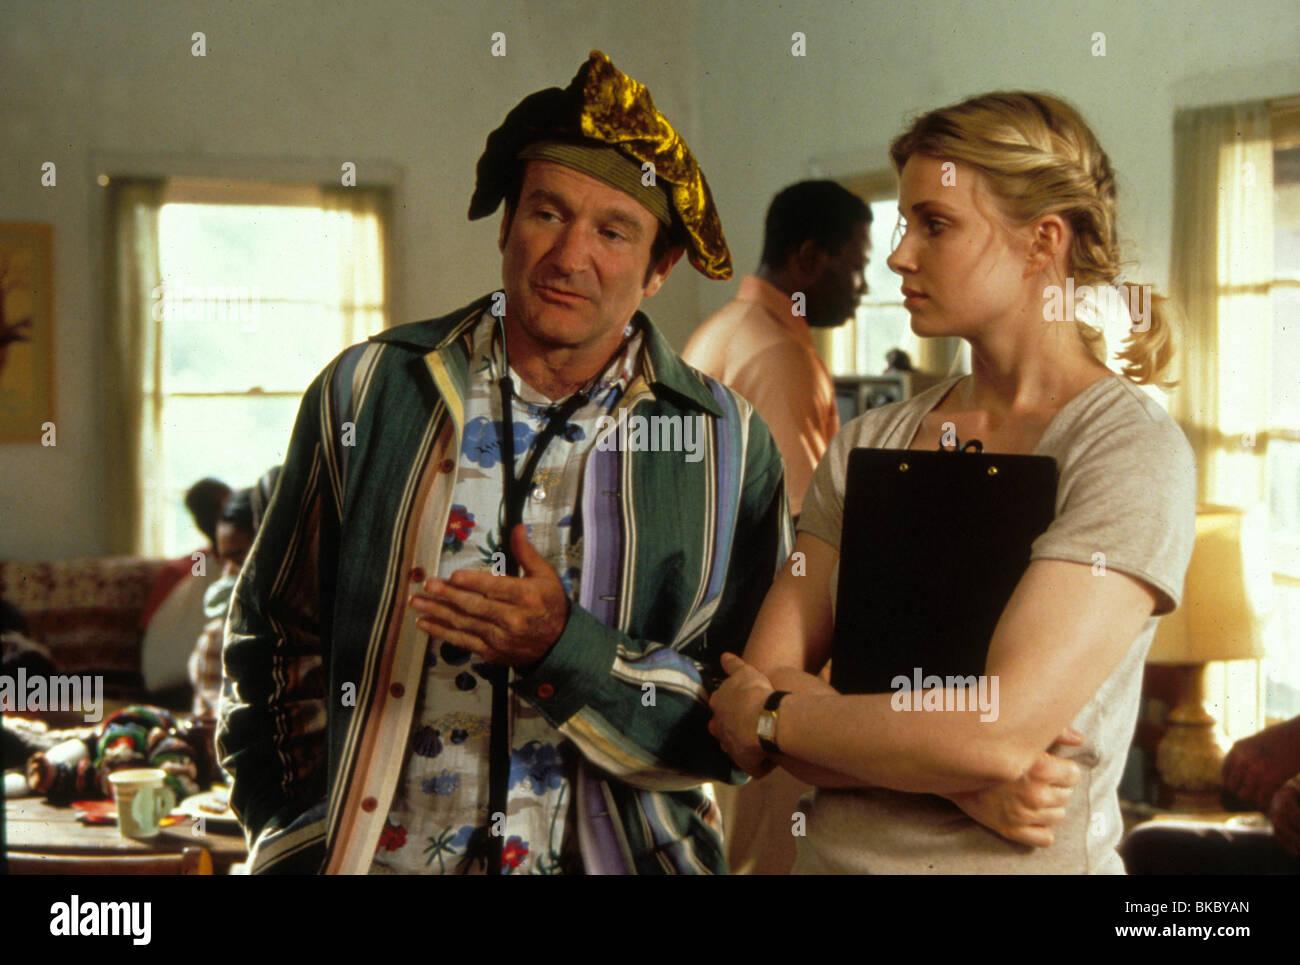 Patch Adams 1998 Robin Williams Monica Potter Pad 016 Stock Photo Alamy